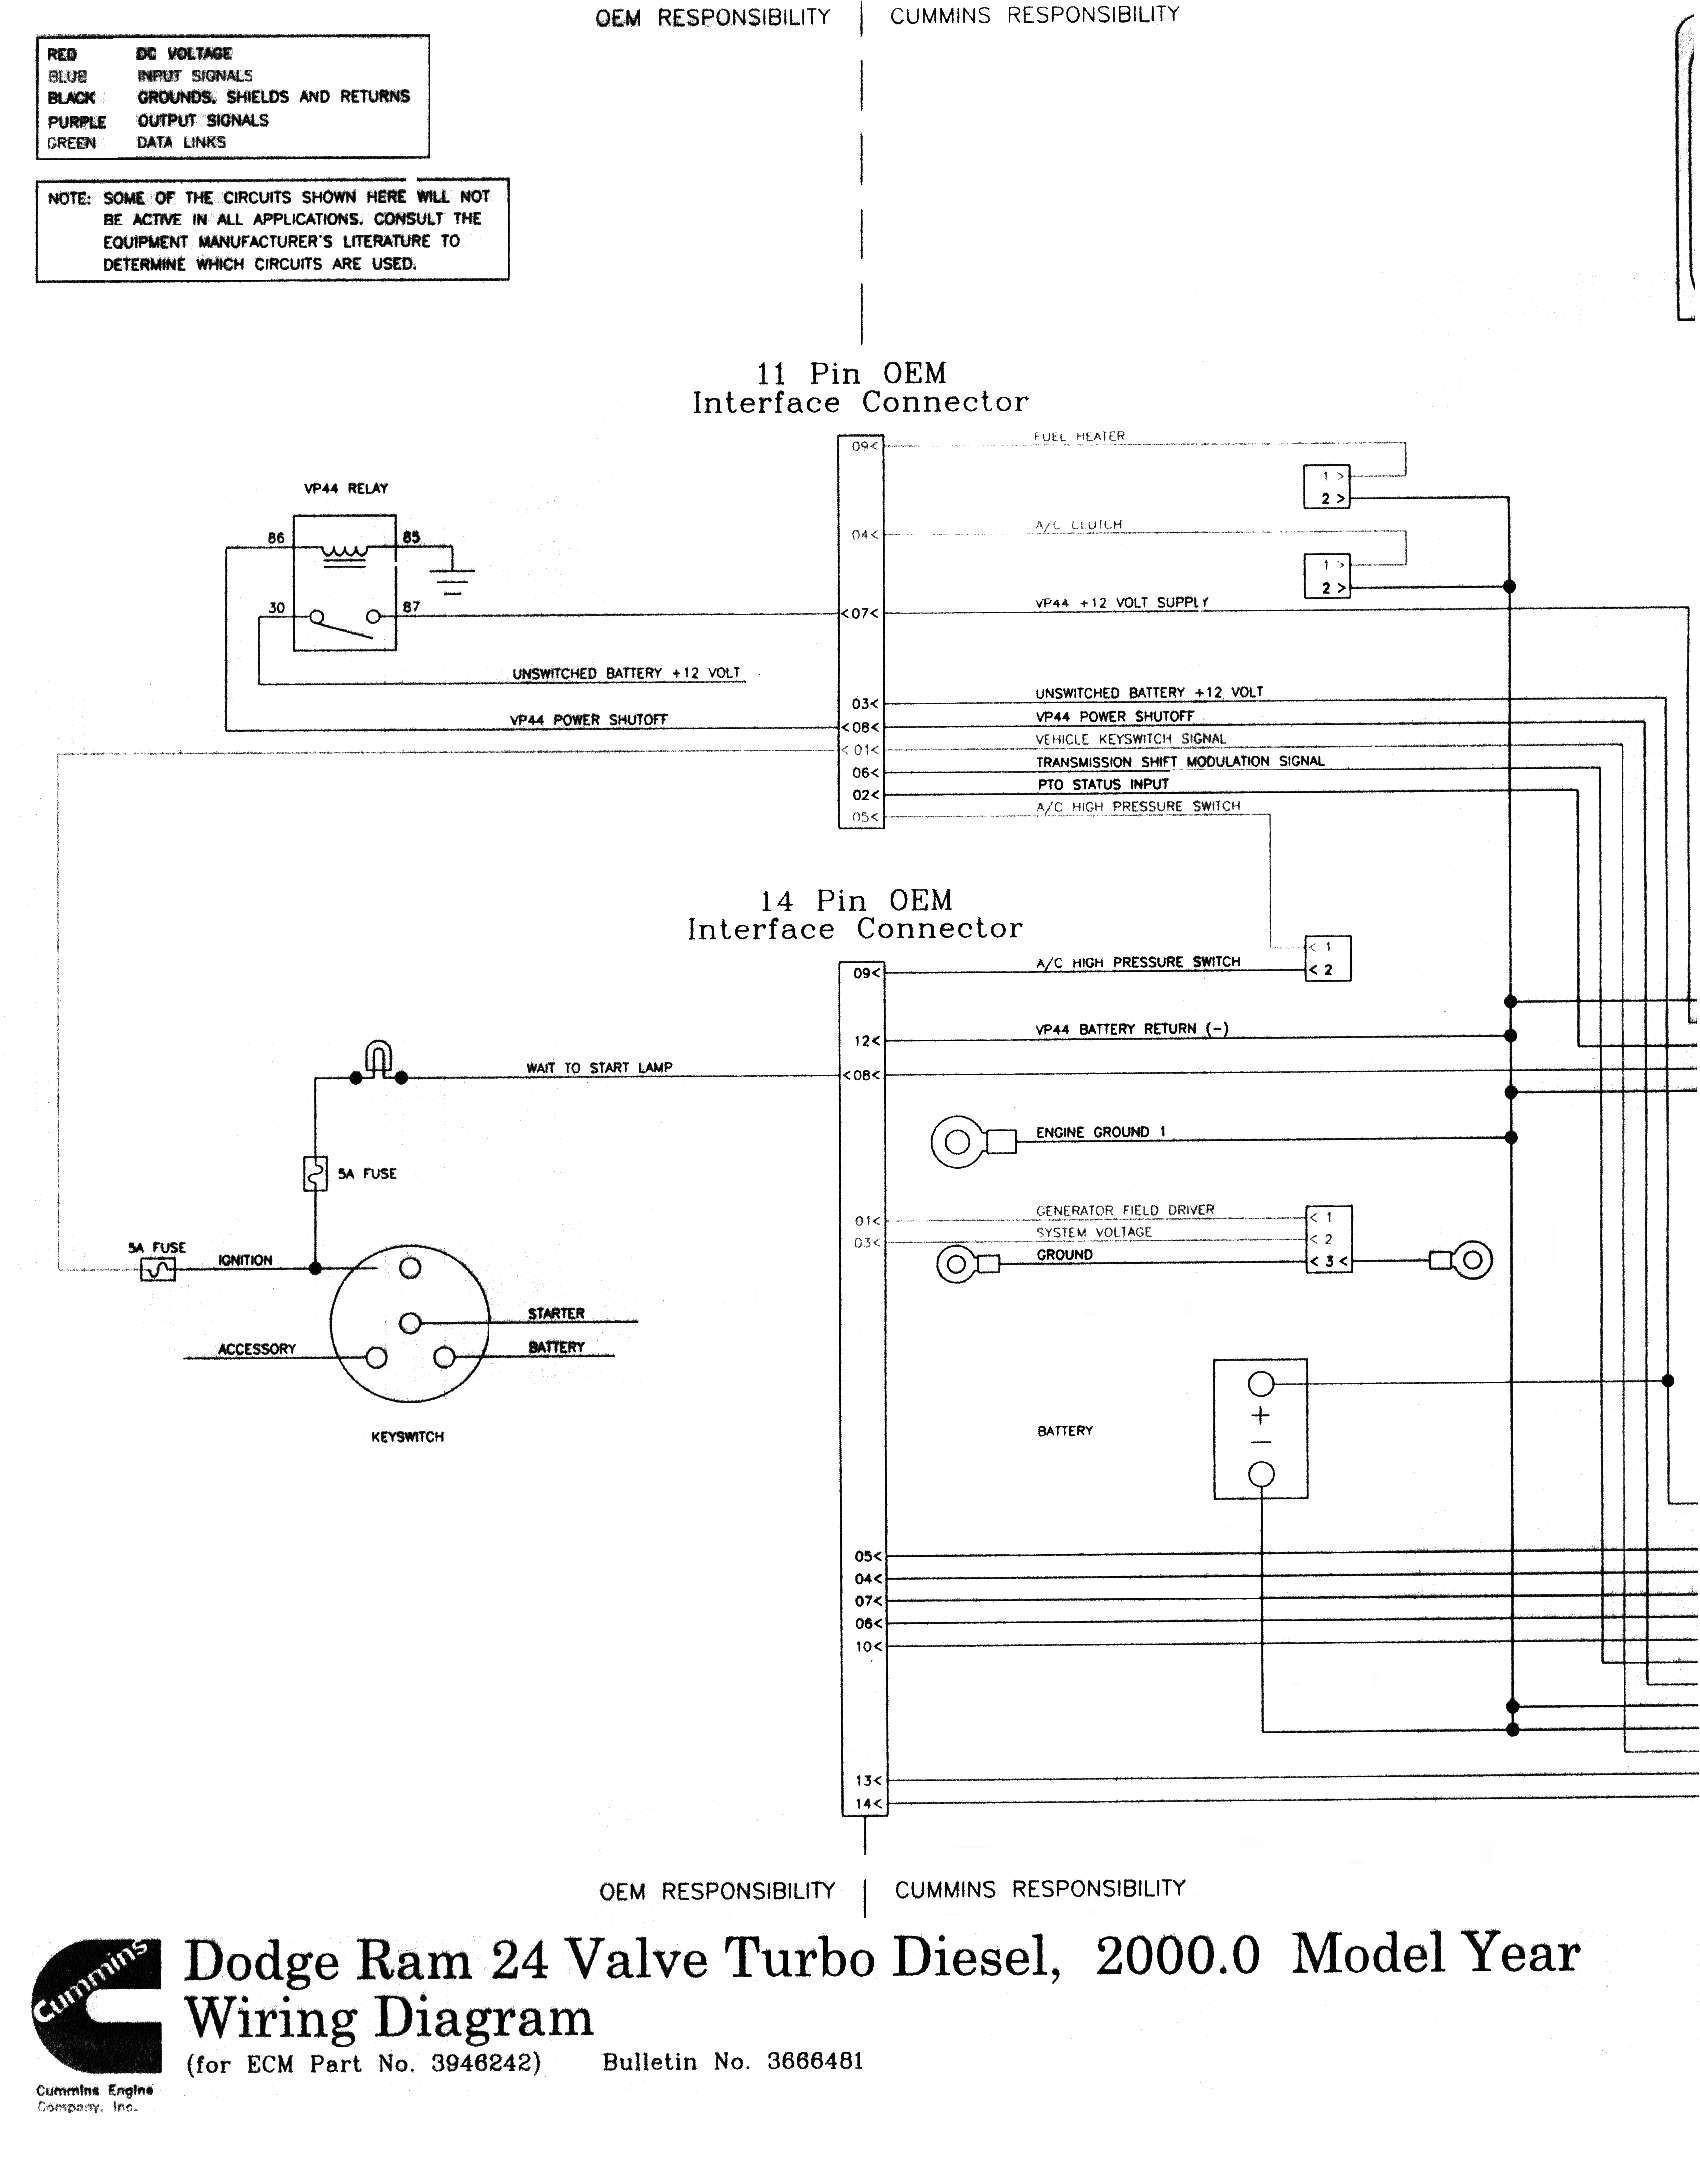 2005 Dodge Ram 1500 Infinity Wiring Diagram Best 2005 Dodge Ram 1500 Infinity Wiring Diagram Fresh Wiring Diagram